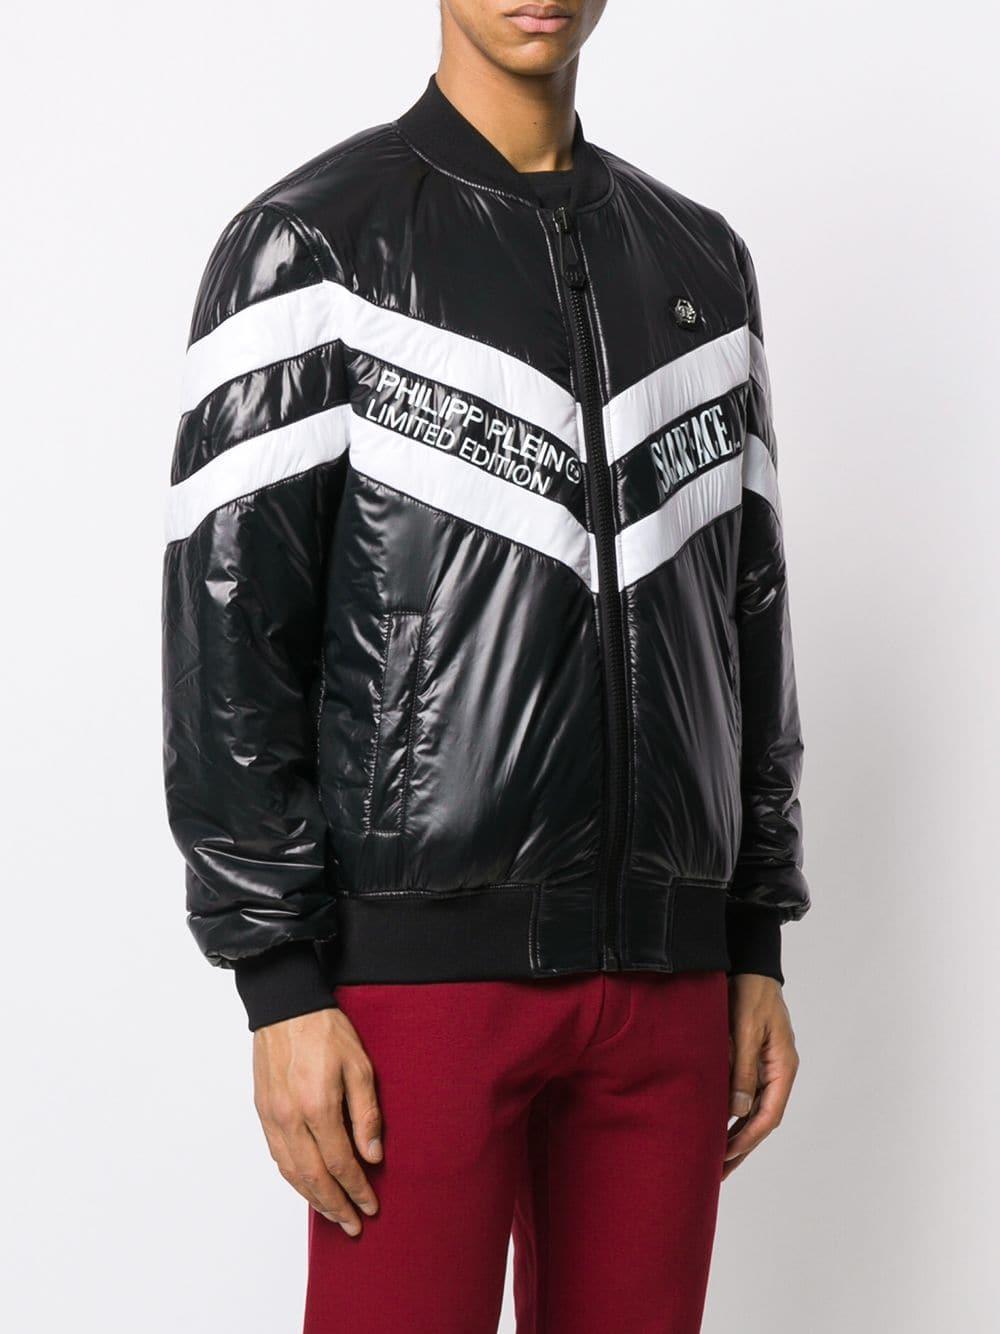 Philipp Plein Bomber Scarface Jacket In Black For Men - Lyst